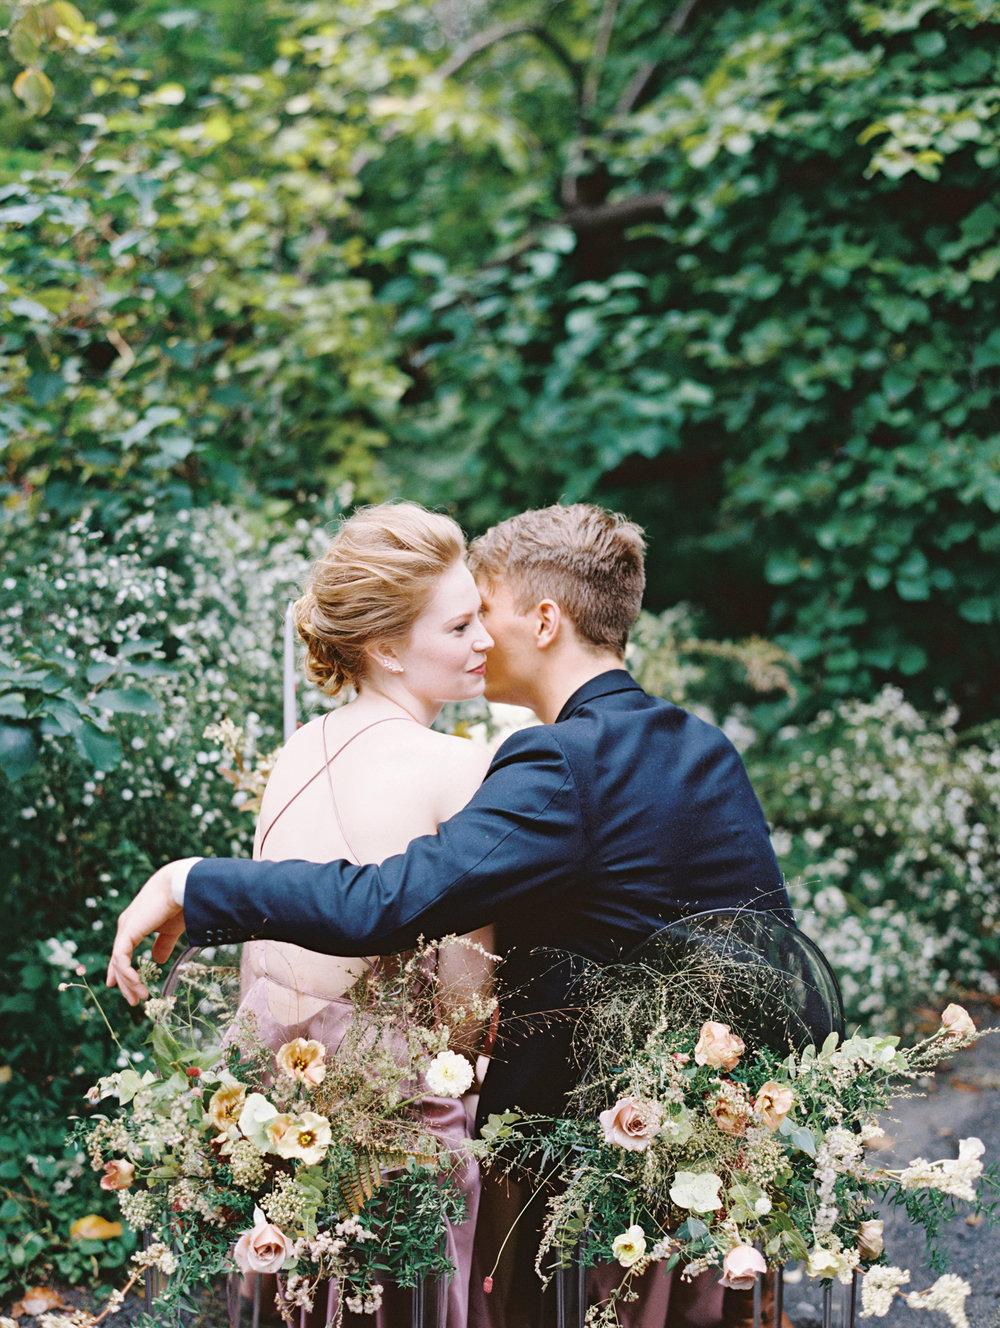 kelsandmichael_bridaleditorial_harvestelopement-82.jpg